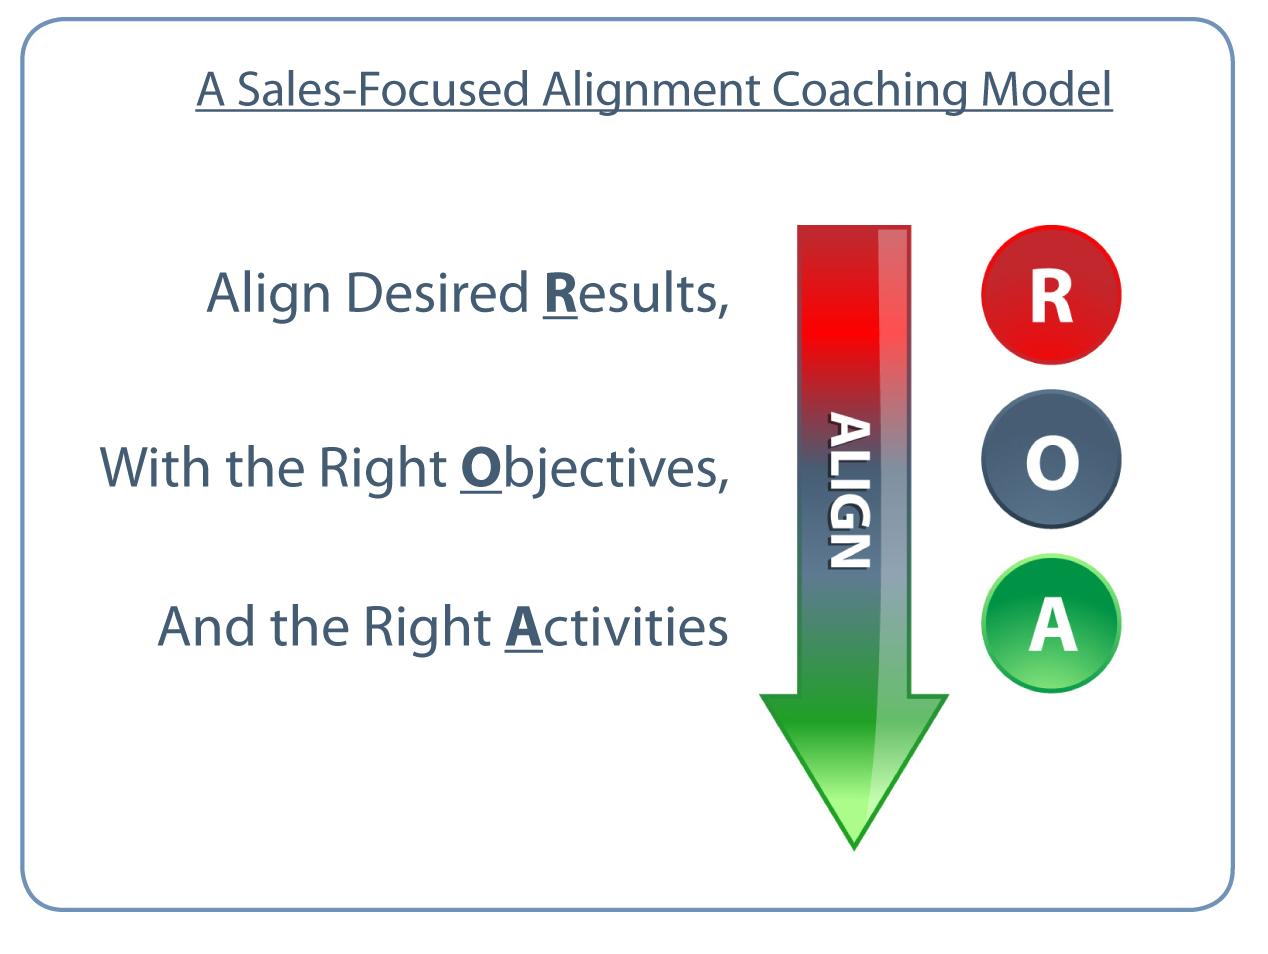 A Sales-Focused Alignment Model